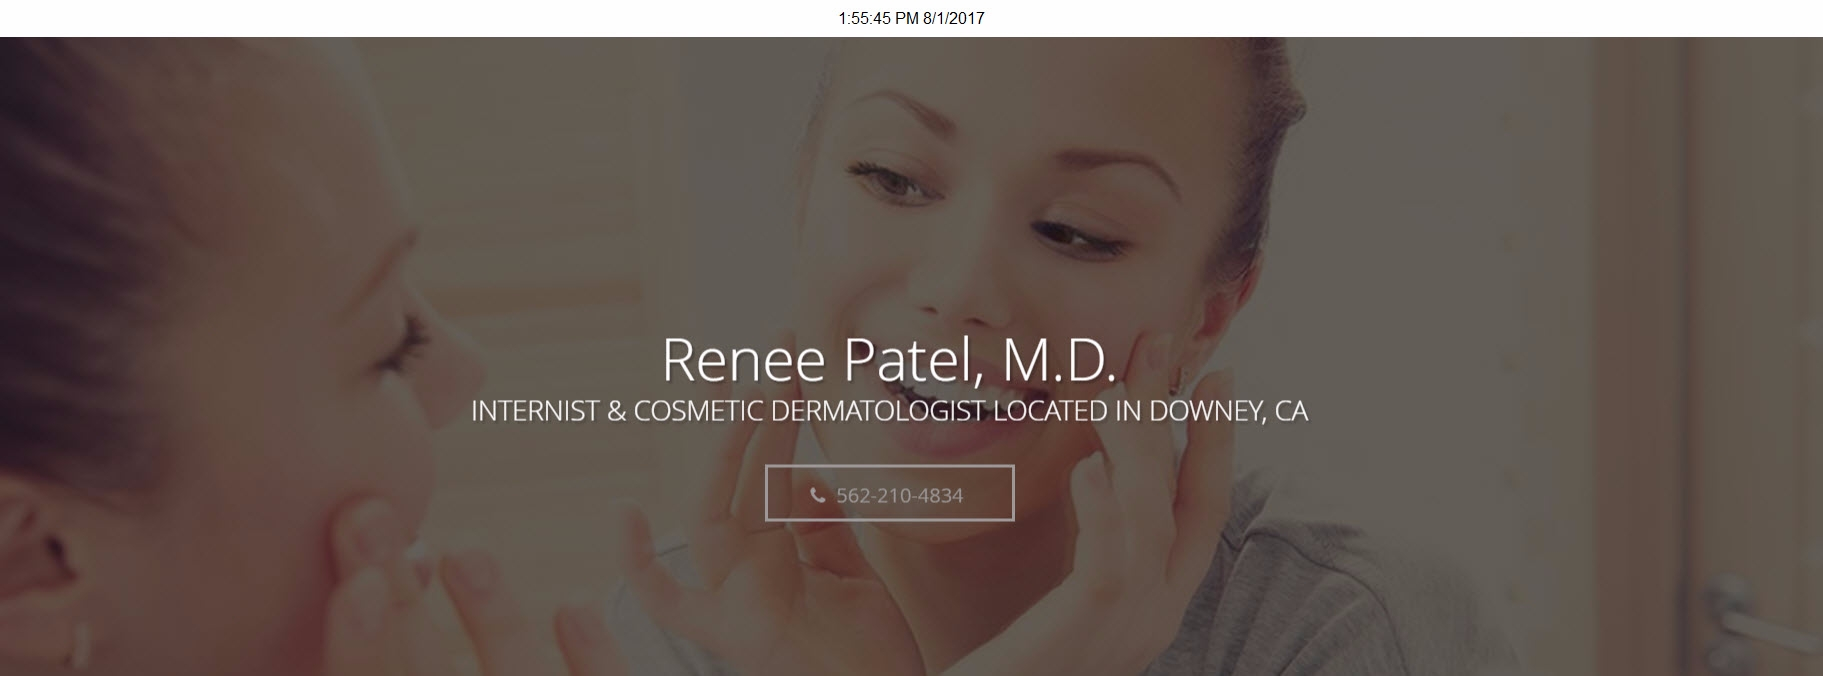 Renee Patel MD Tattoo Removal Los Angeles (@reneepatelmd) Cover Image